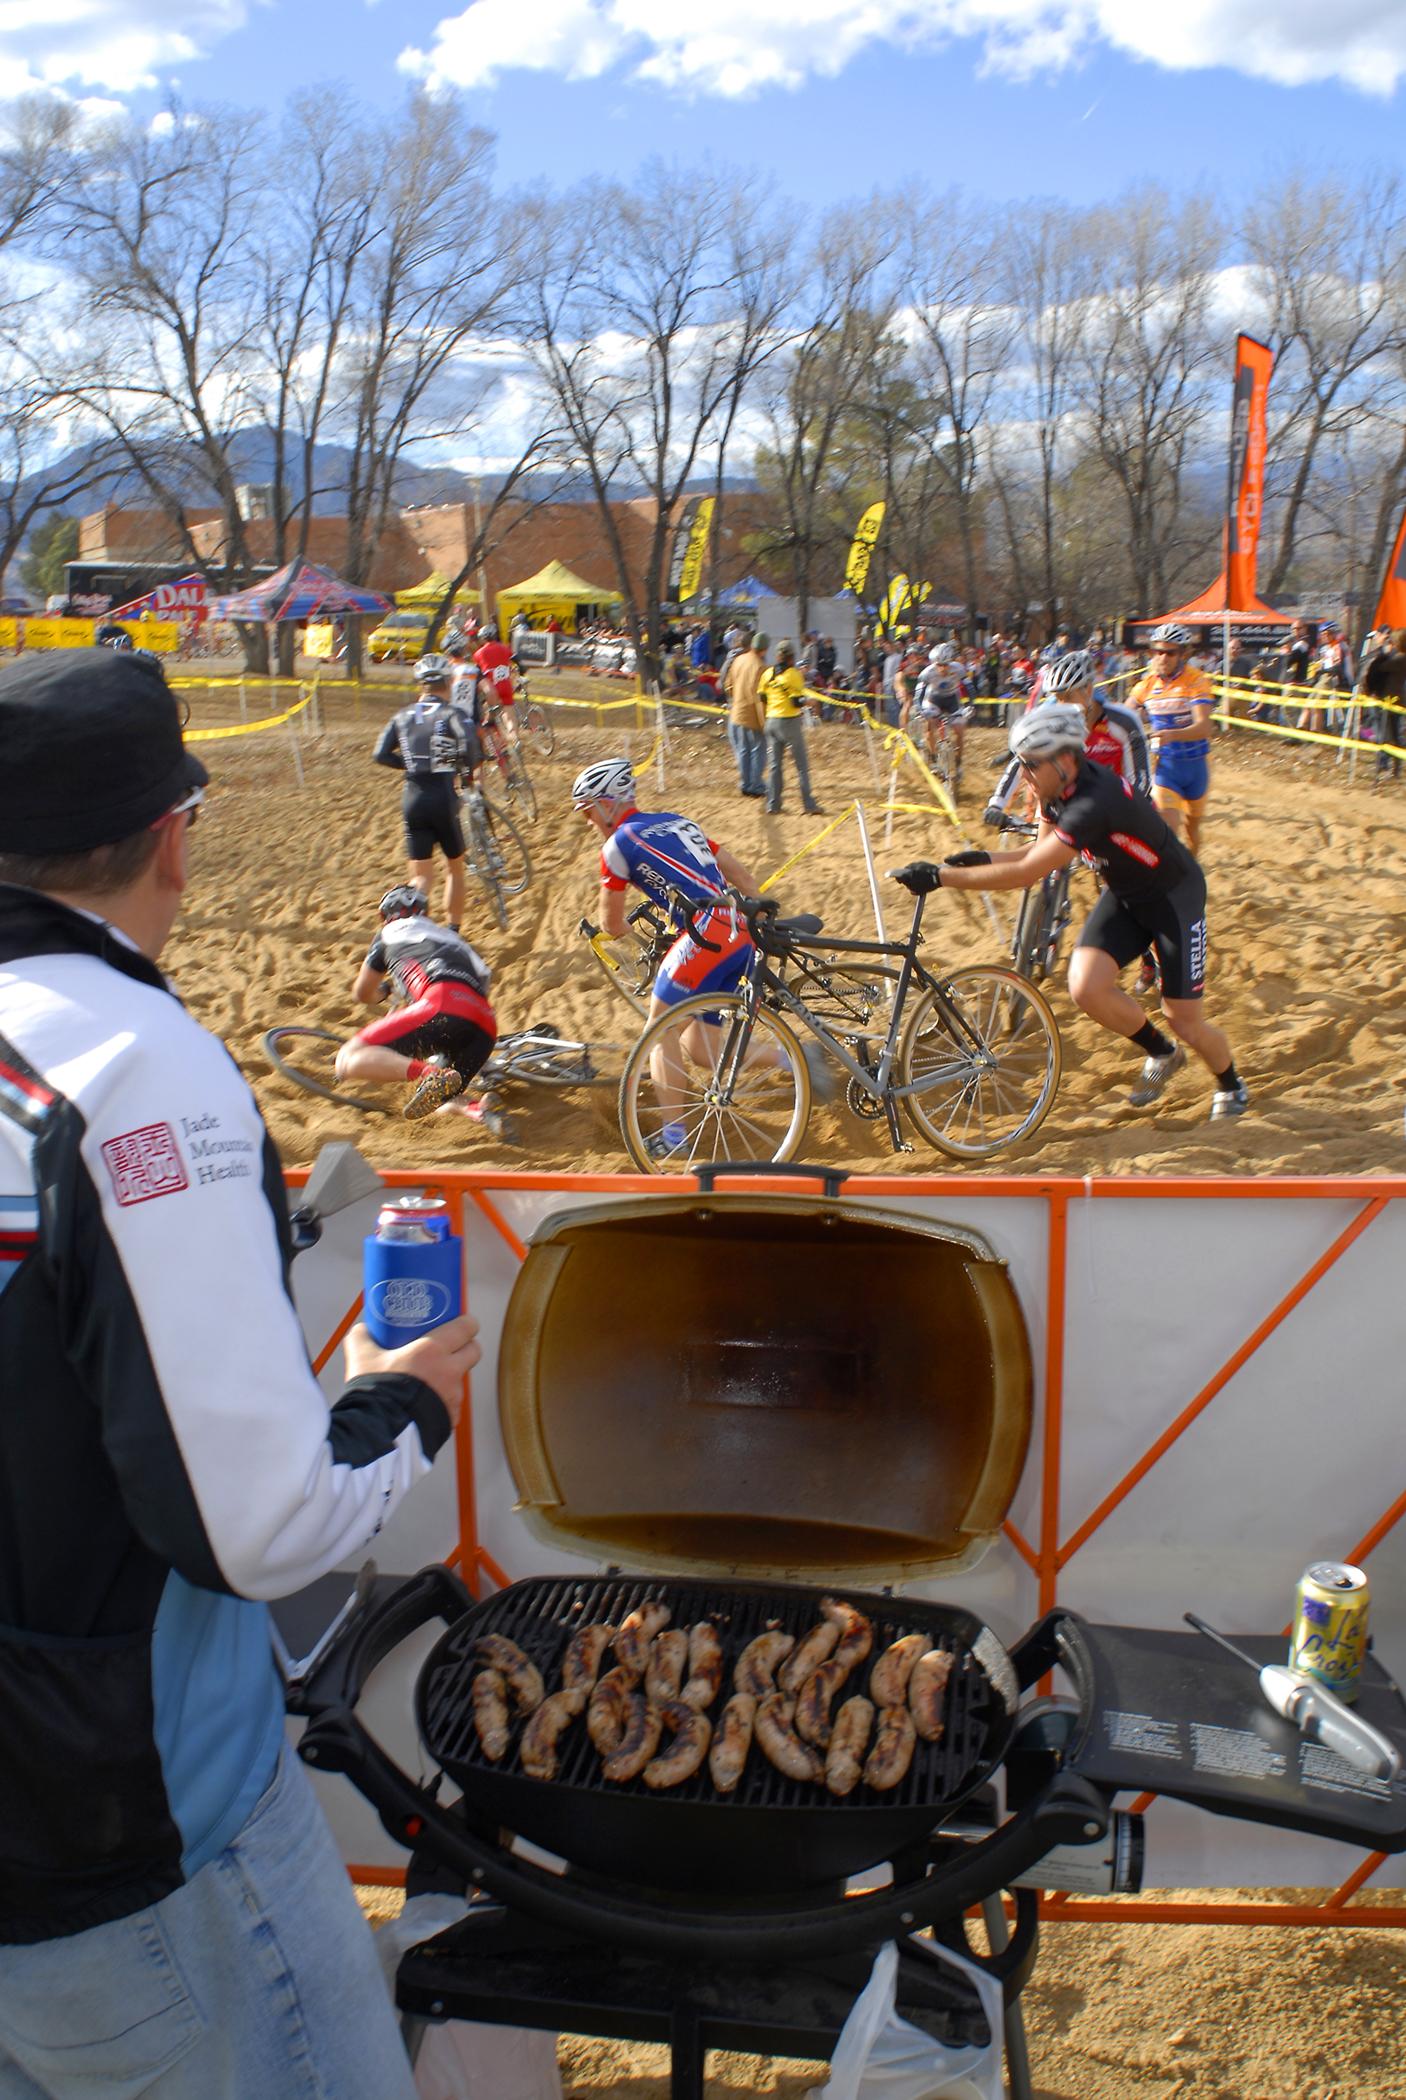 Cyclocross, crashes, brats & beer.